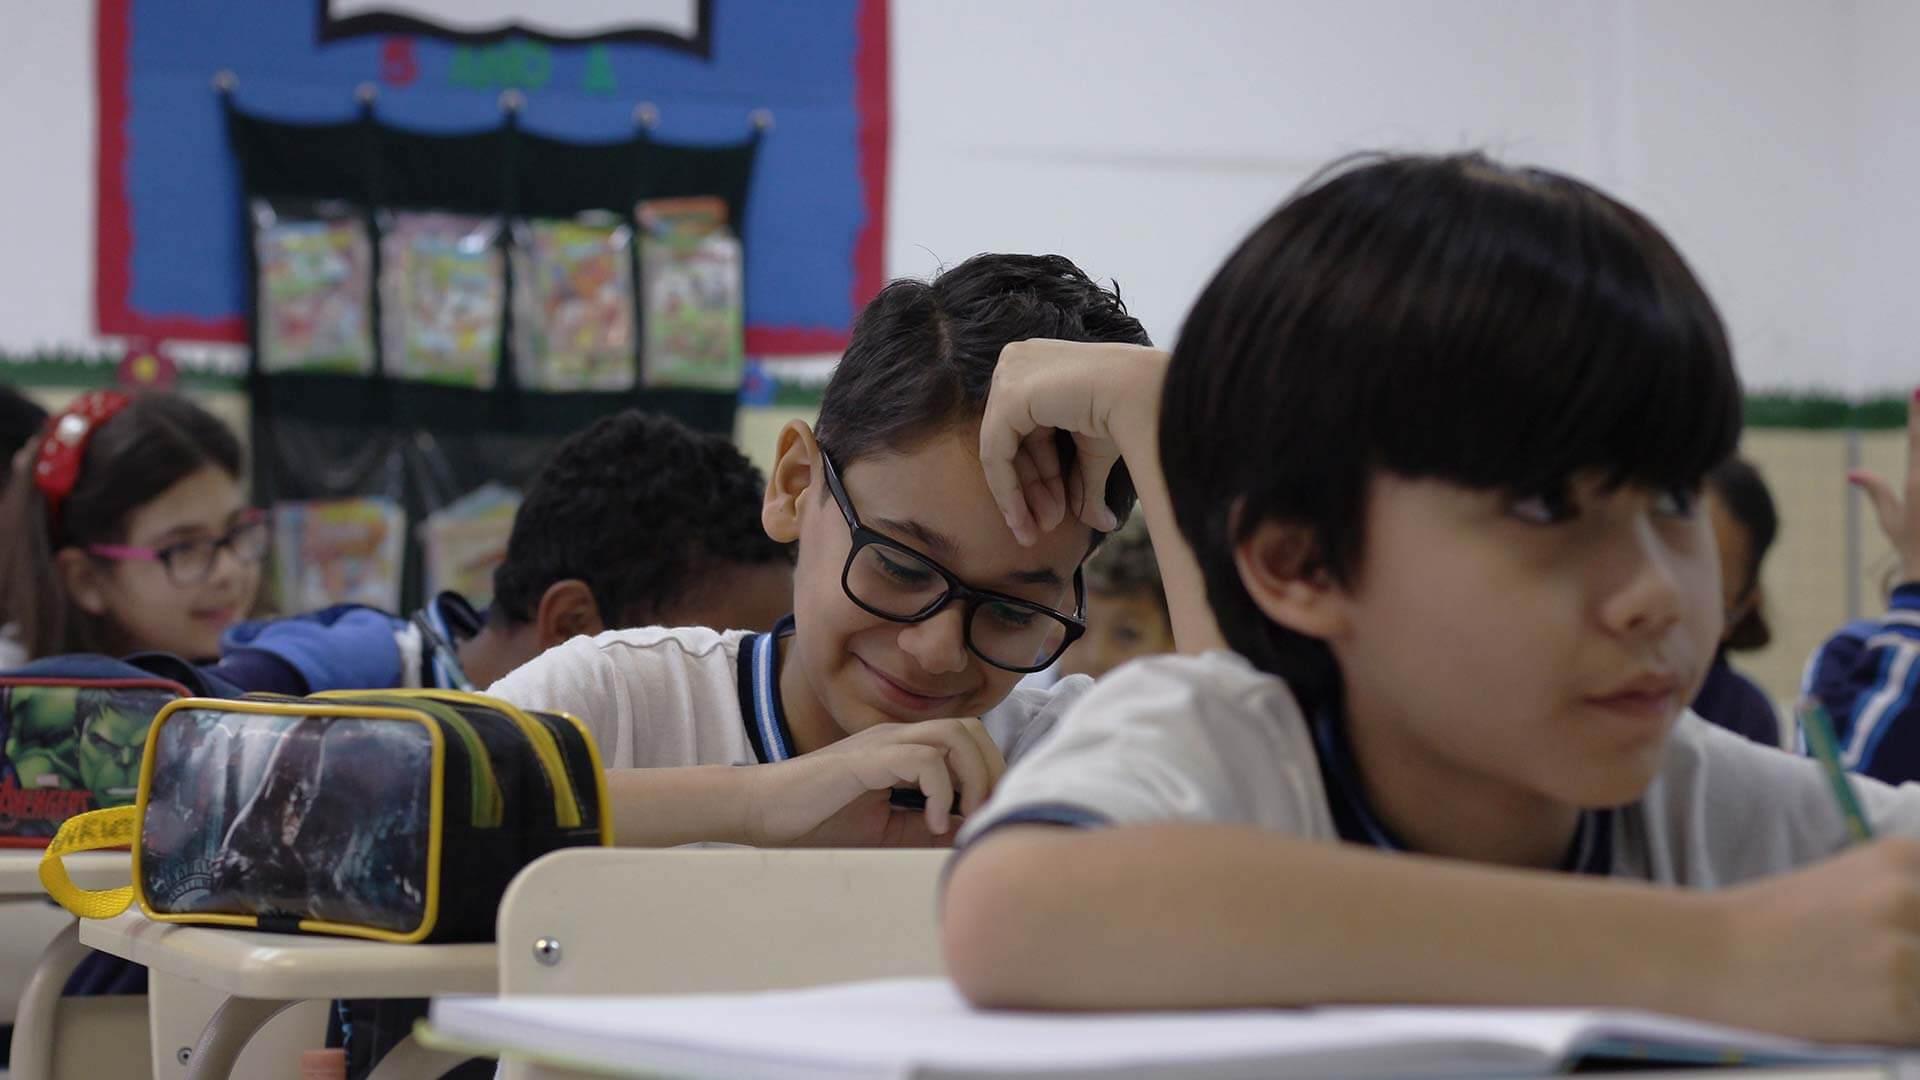 O Clima Escolar e a Convivência Respeitosa